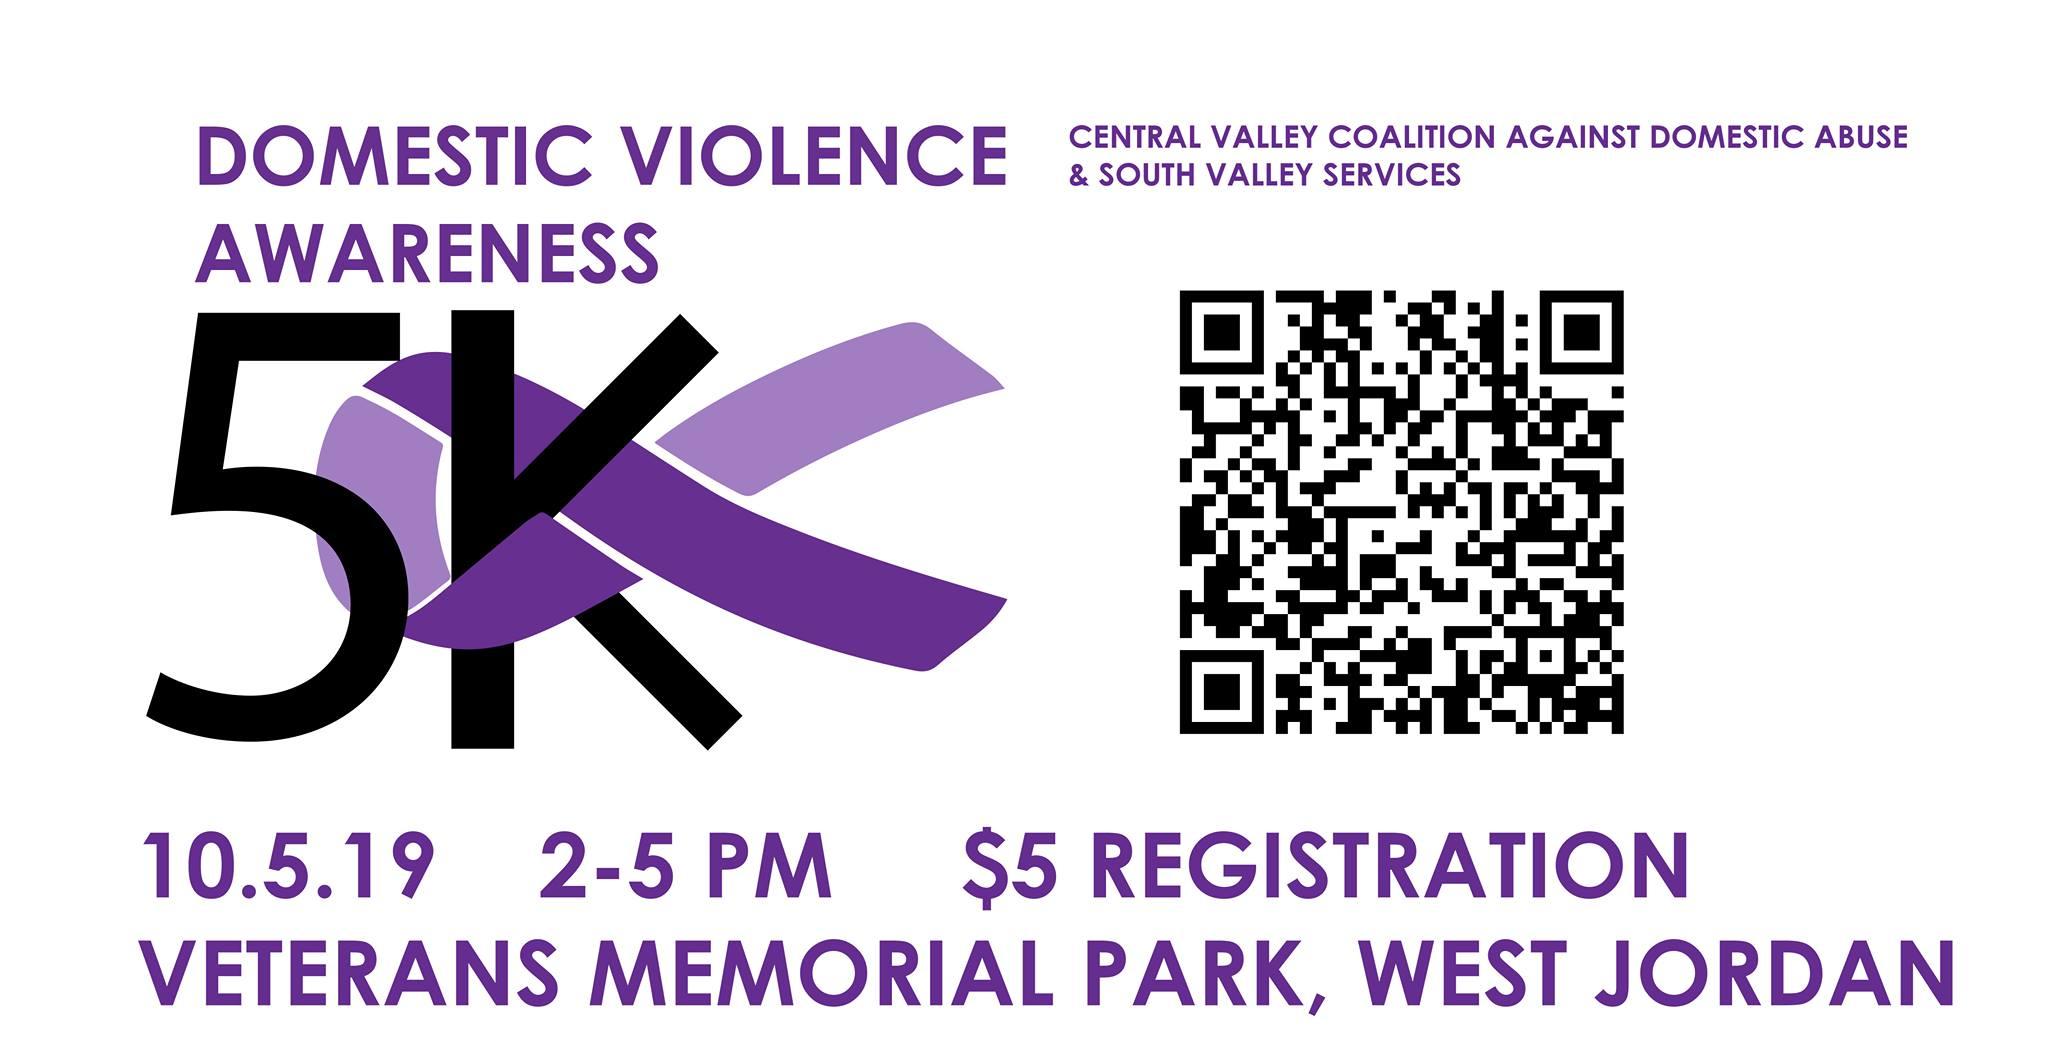 Domestic Violence Awareness 5K